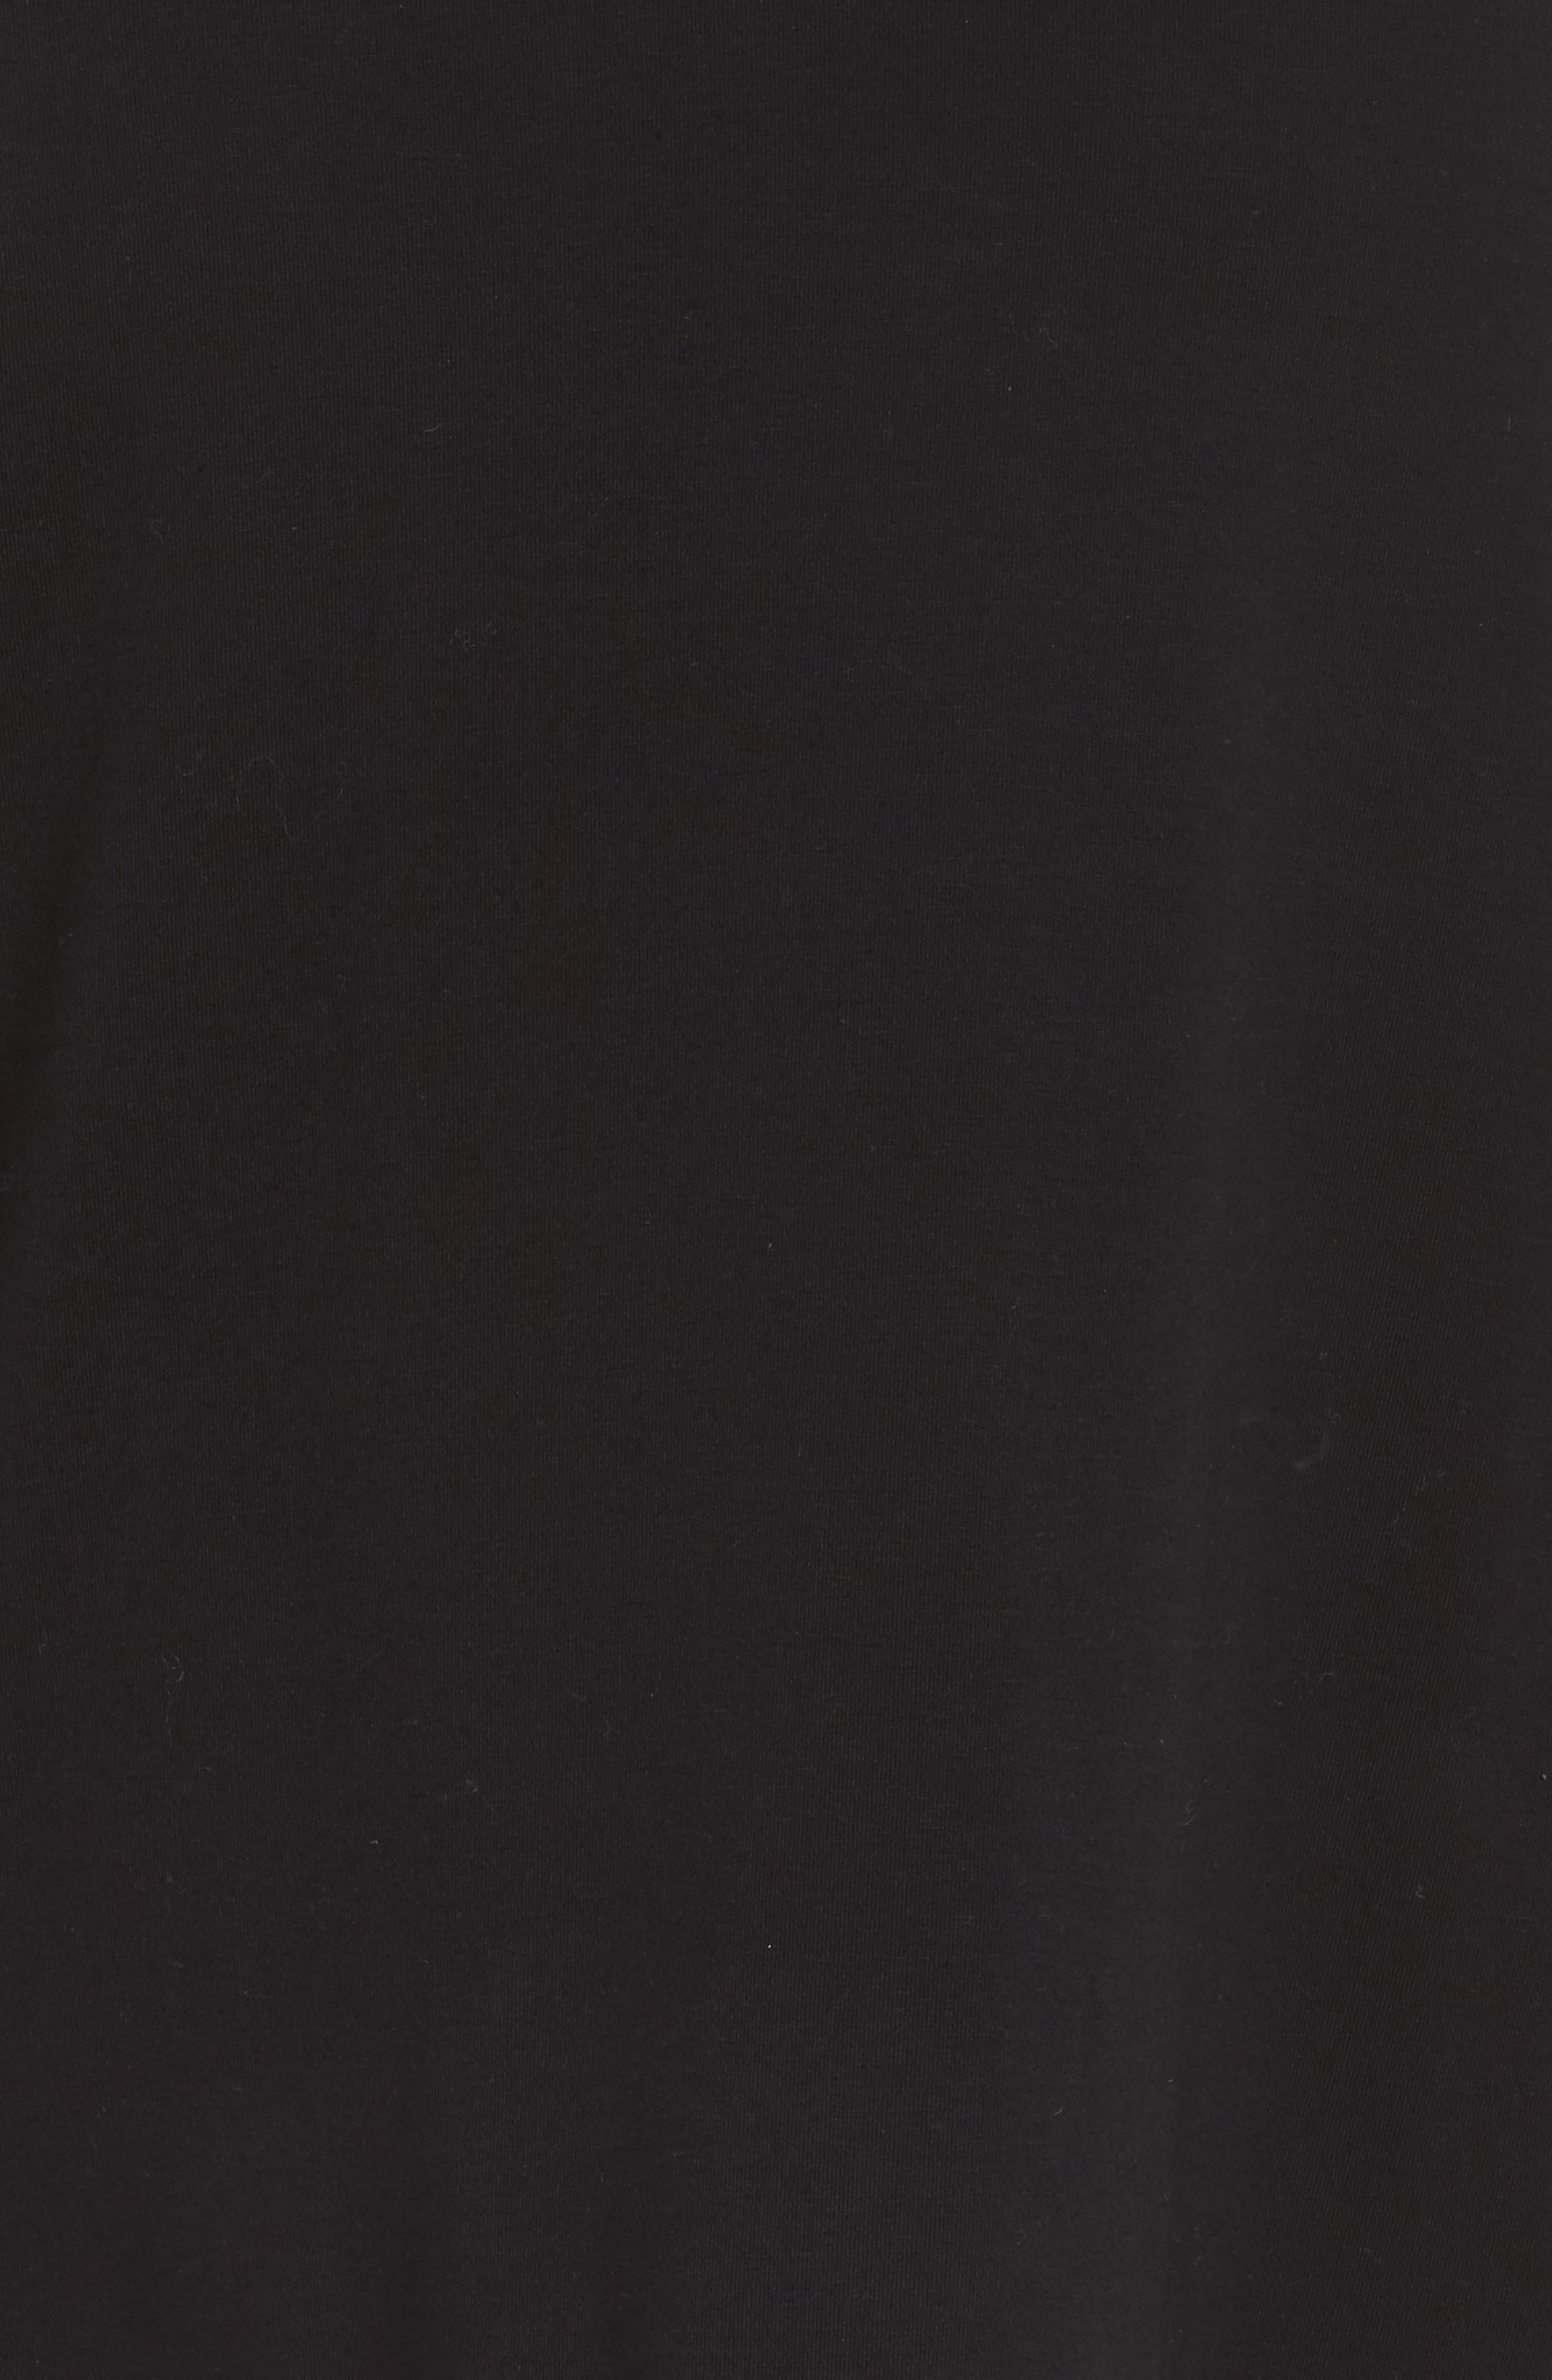 Organic Jersey Side Zip Top,                             Alternate thumbnail 6, color,                             001